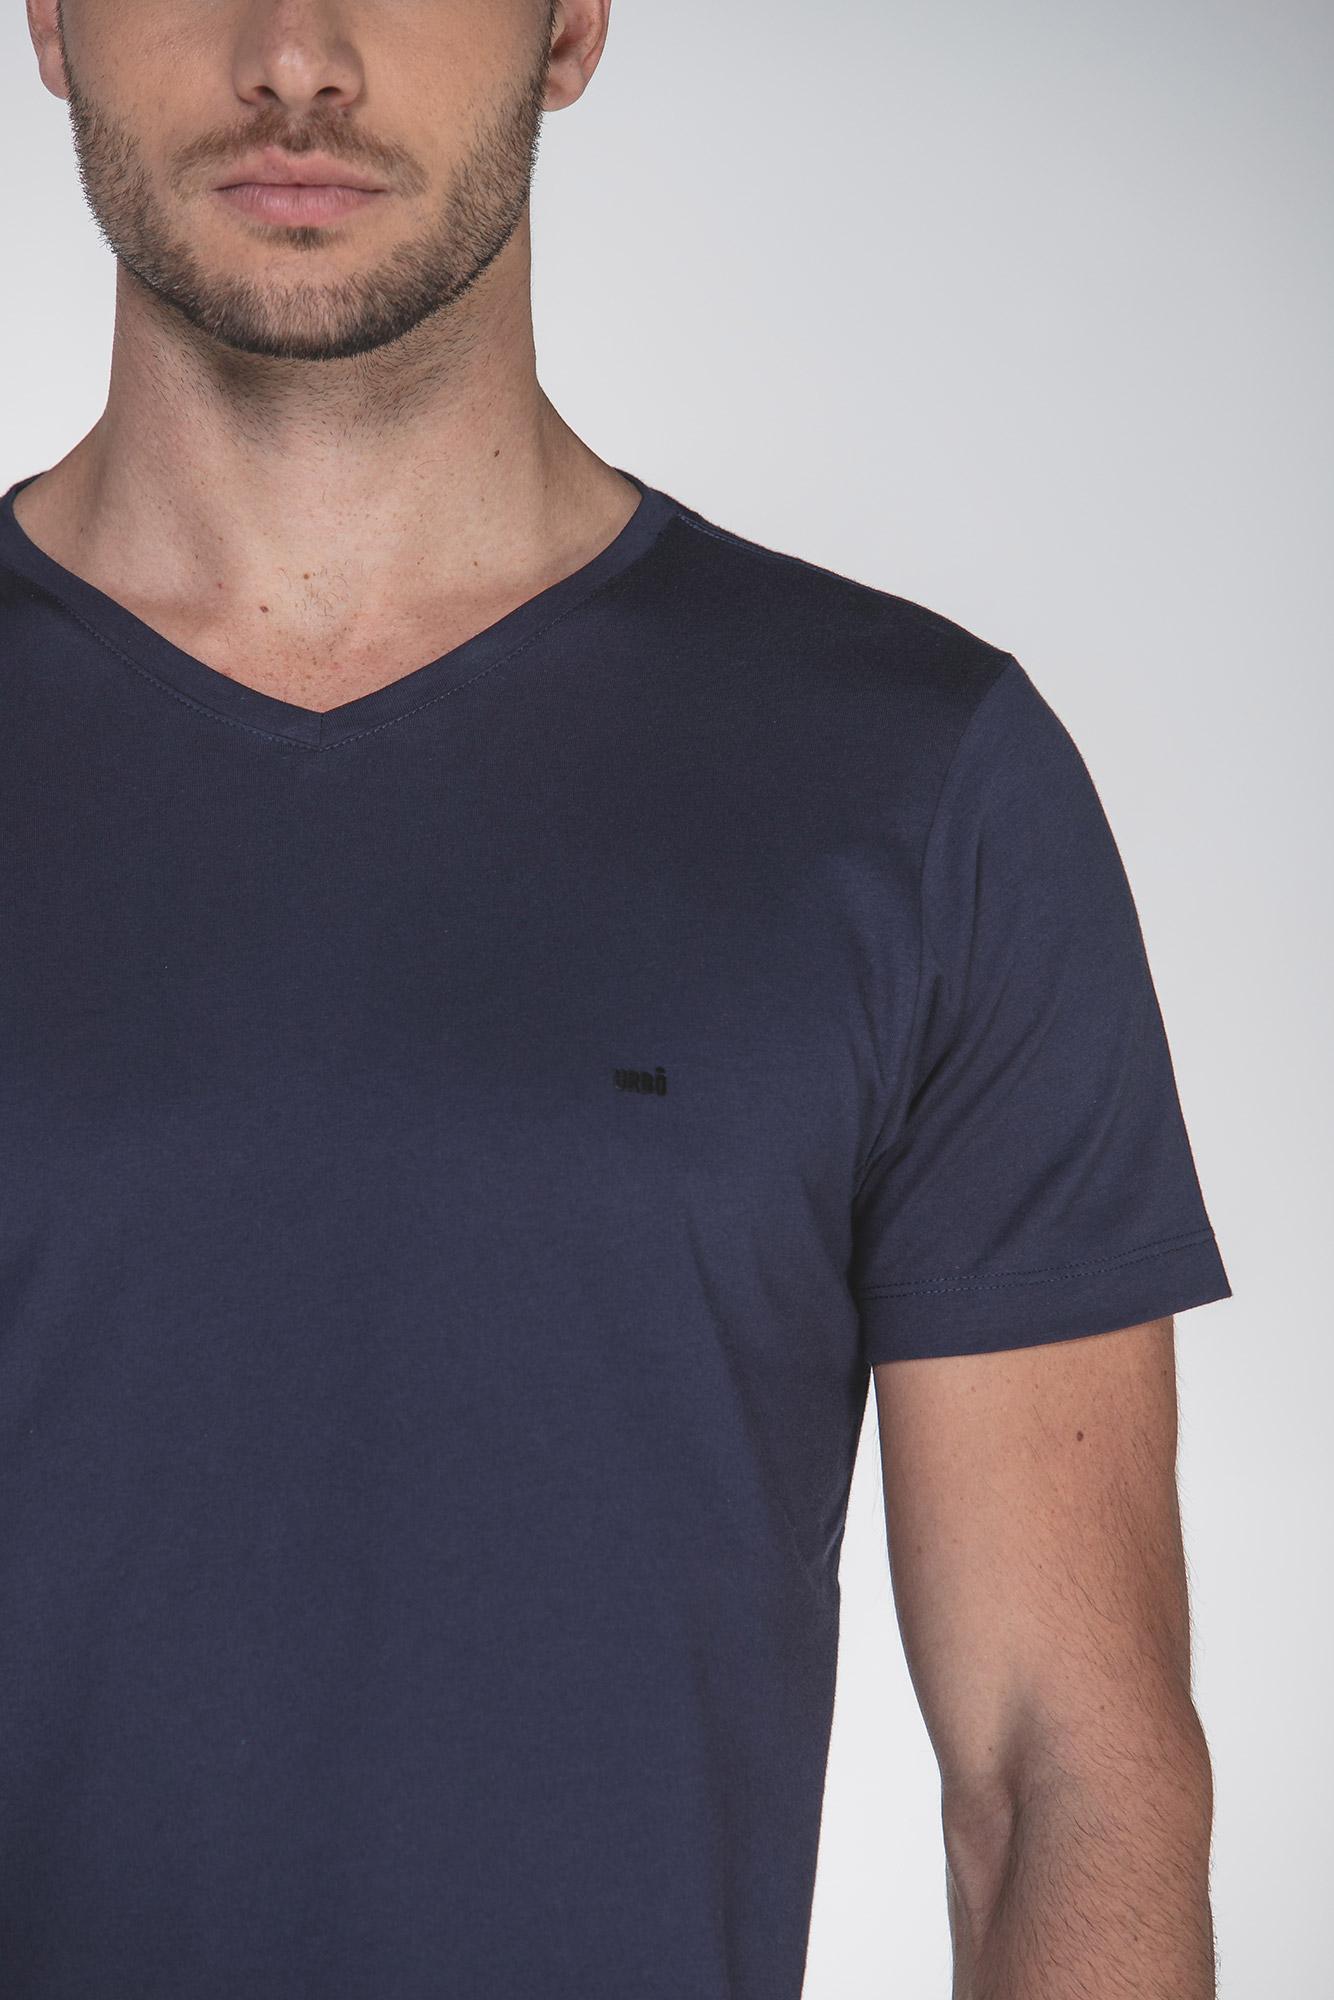 Camiseta Egypt Simple V Azul